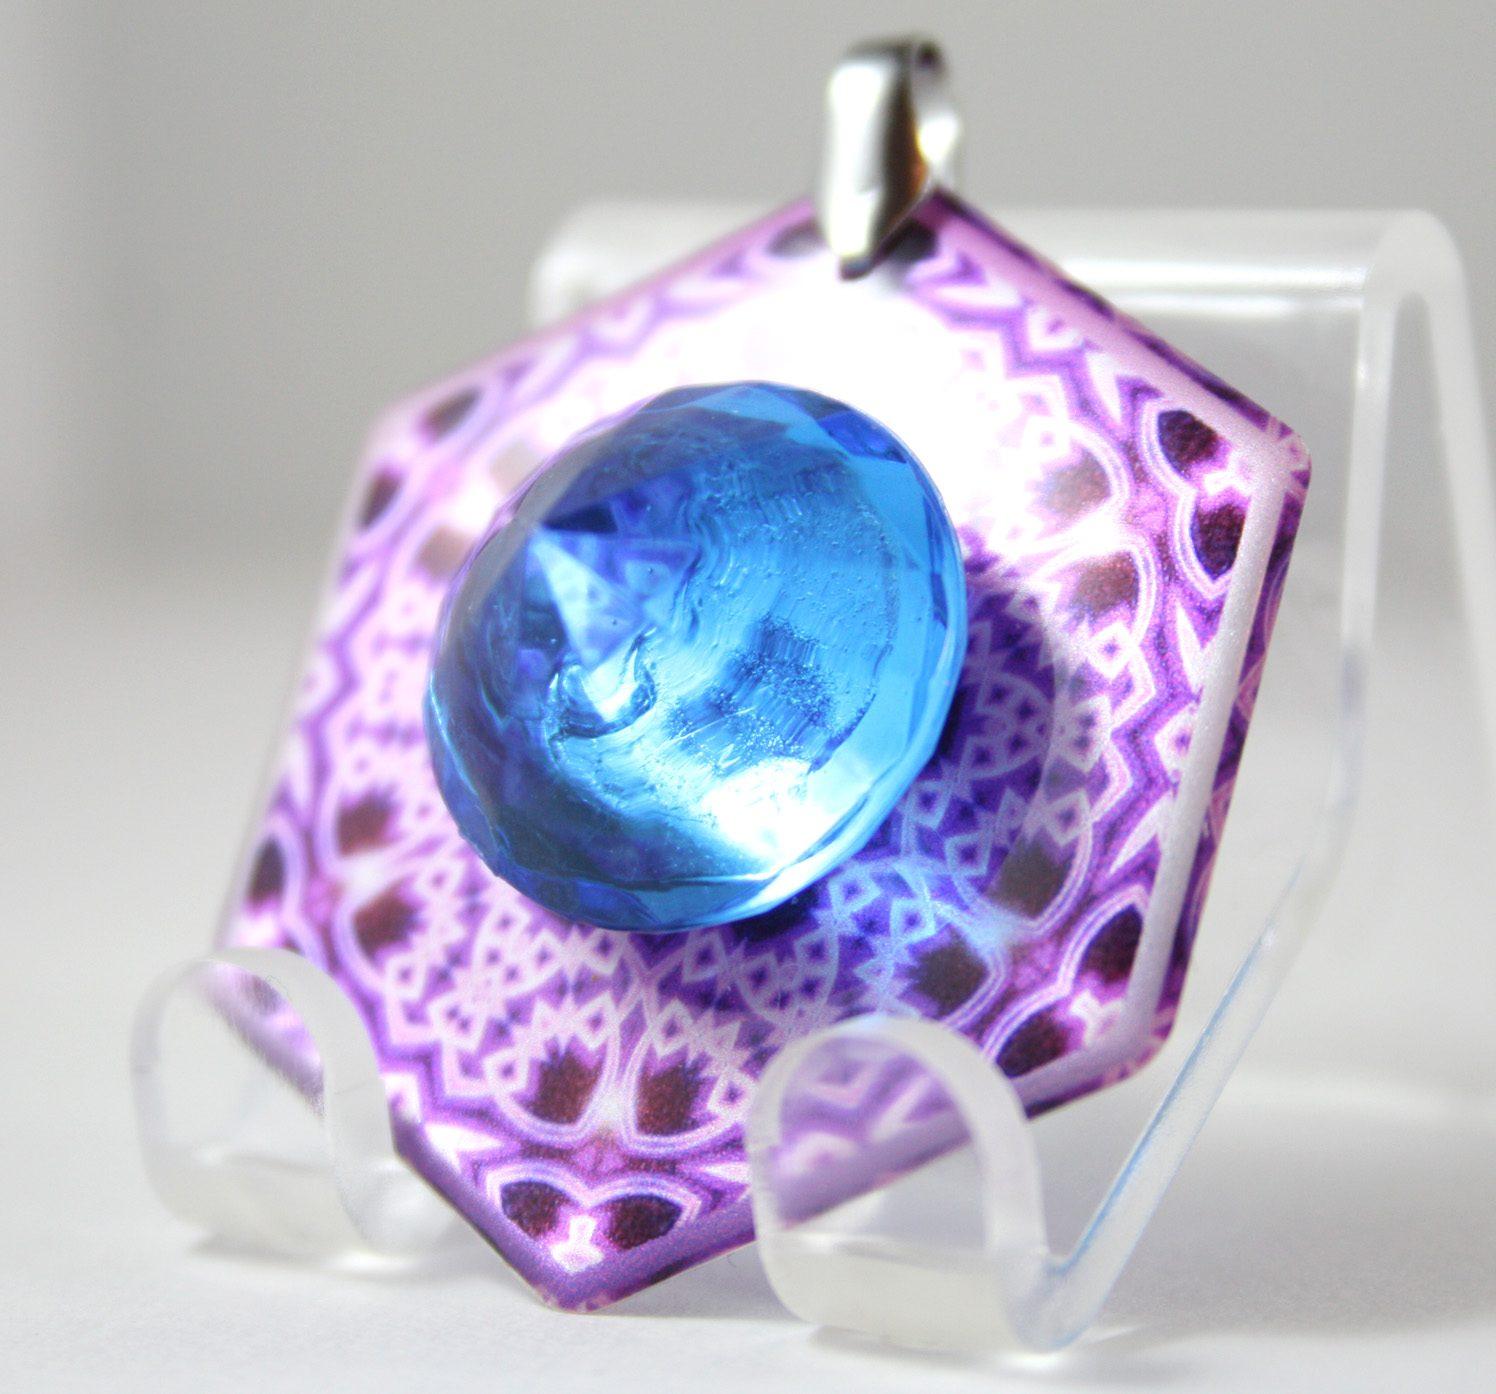 awakened-one-bio-harmonic-double-blue-01